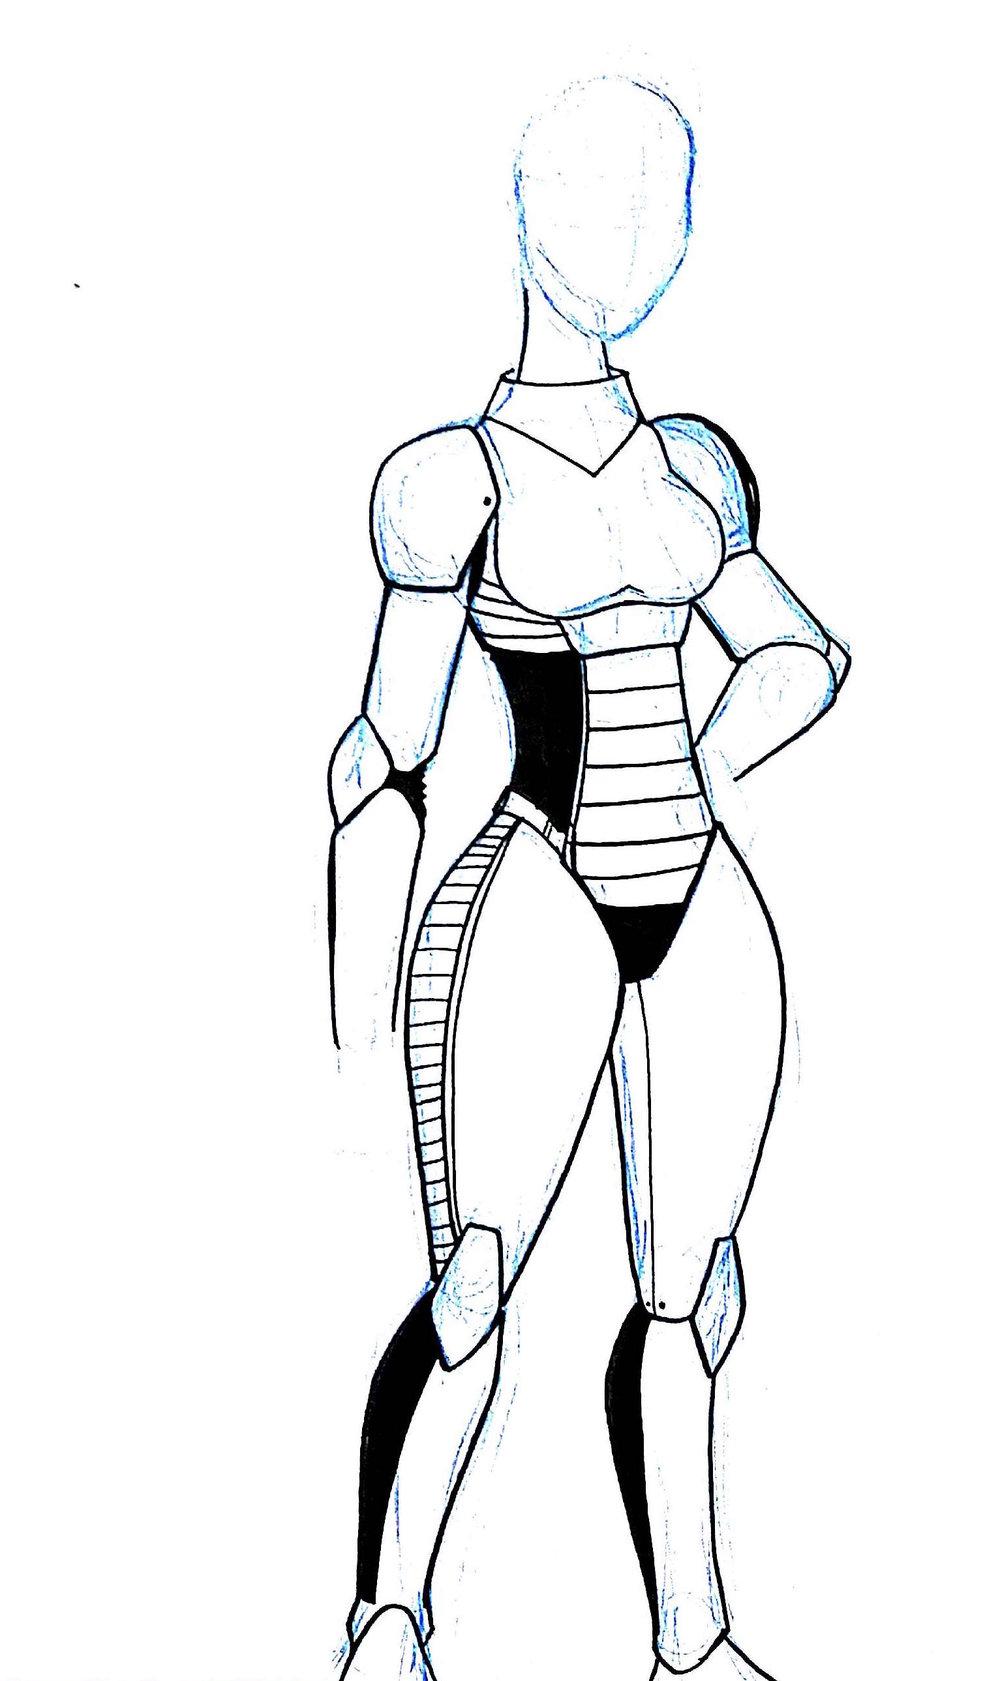 retrograde nova erika christie patricia titan treeler science fiction transmedia space ship captain black woman blerd